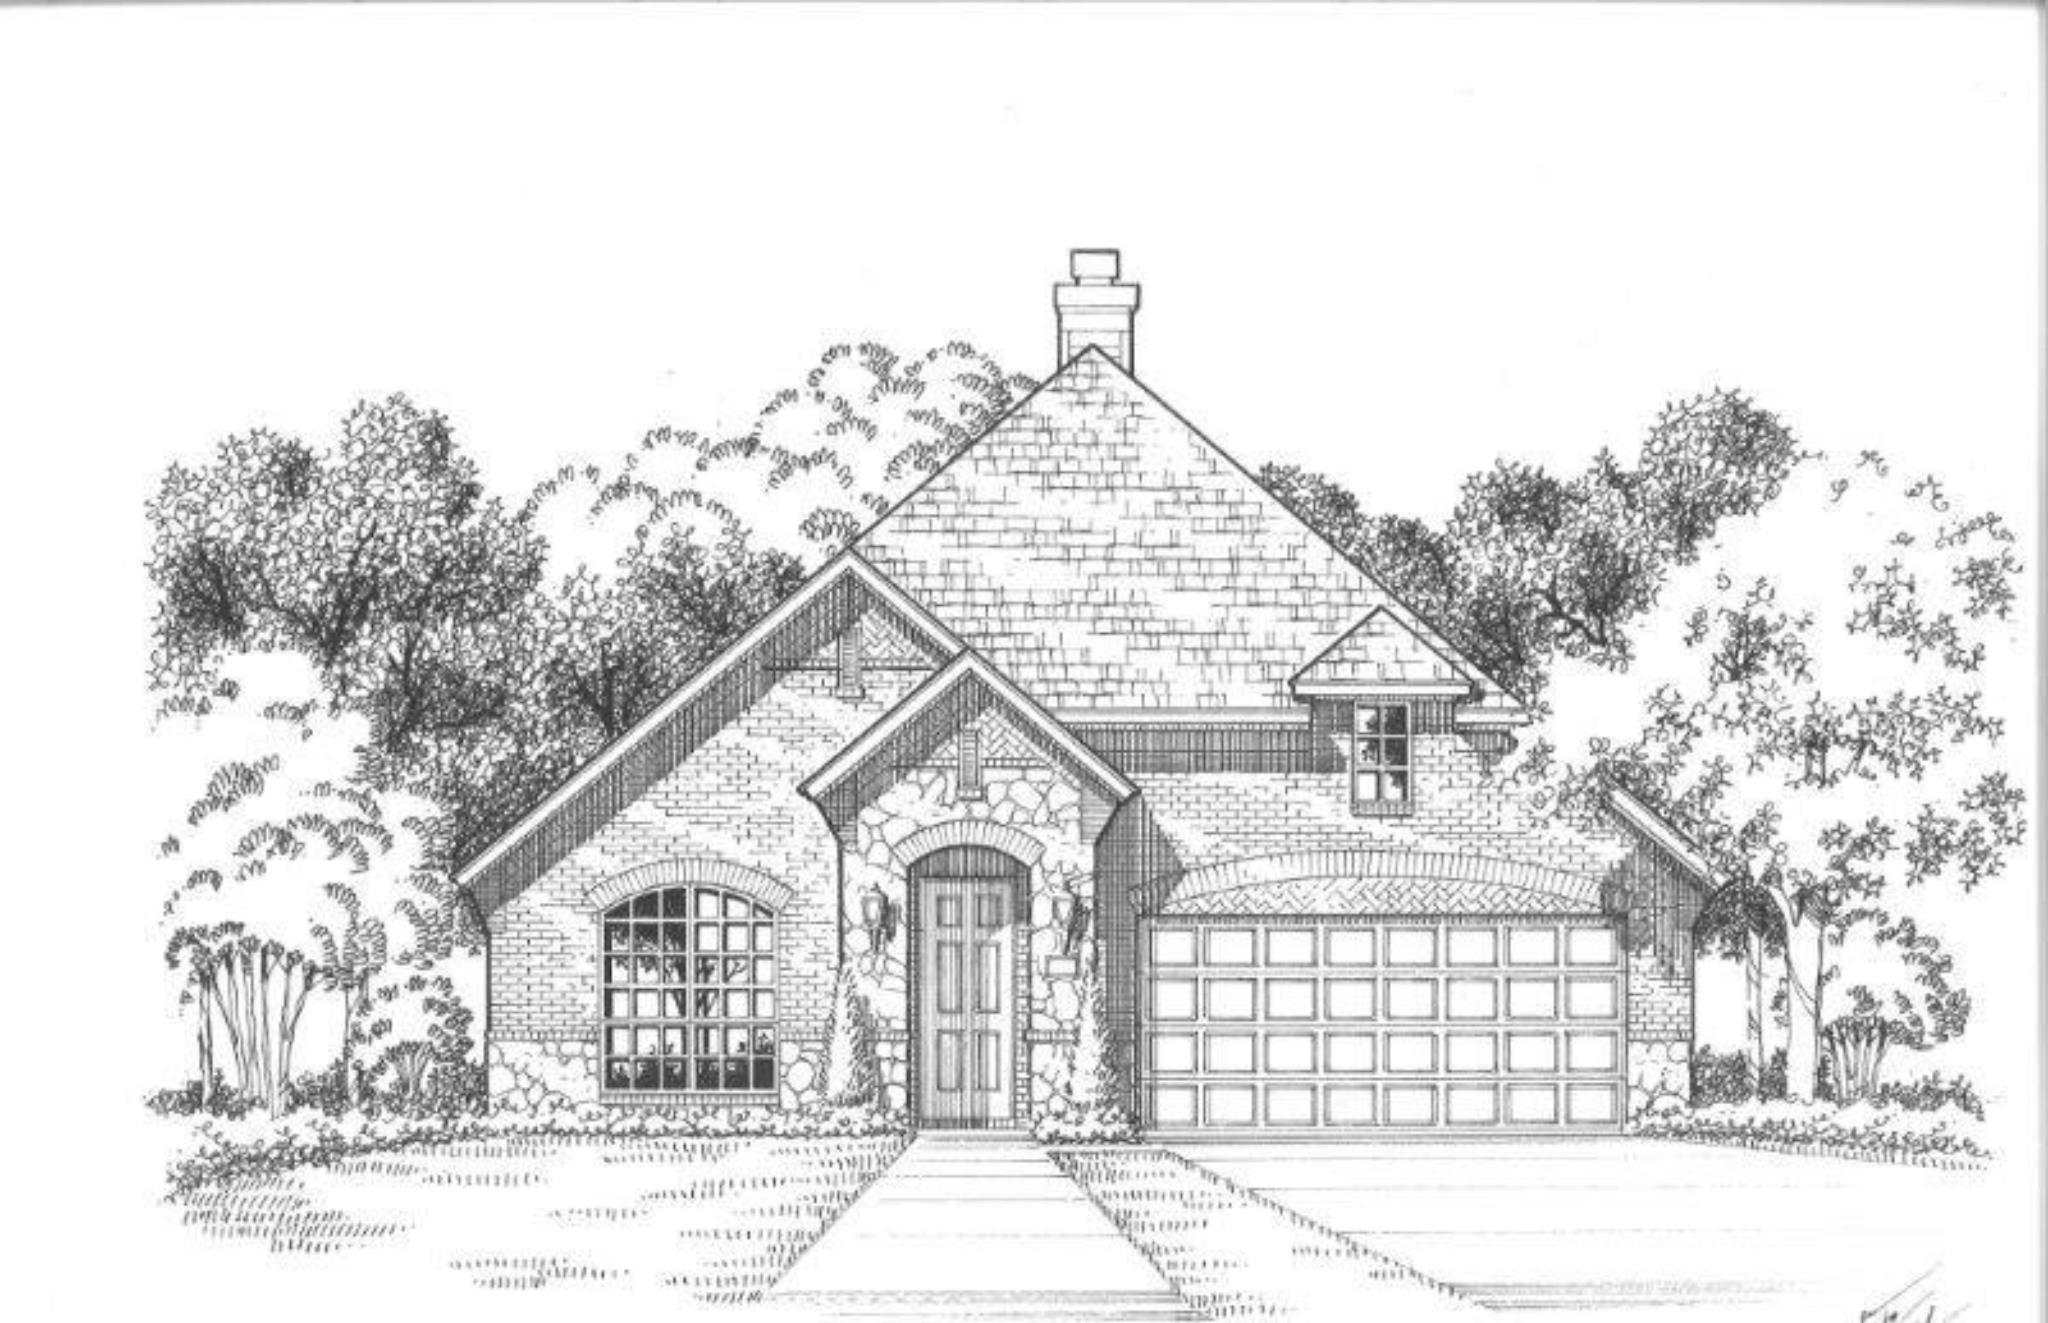 New Homes For Sale In 75043 Dallas